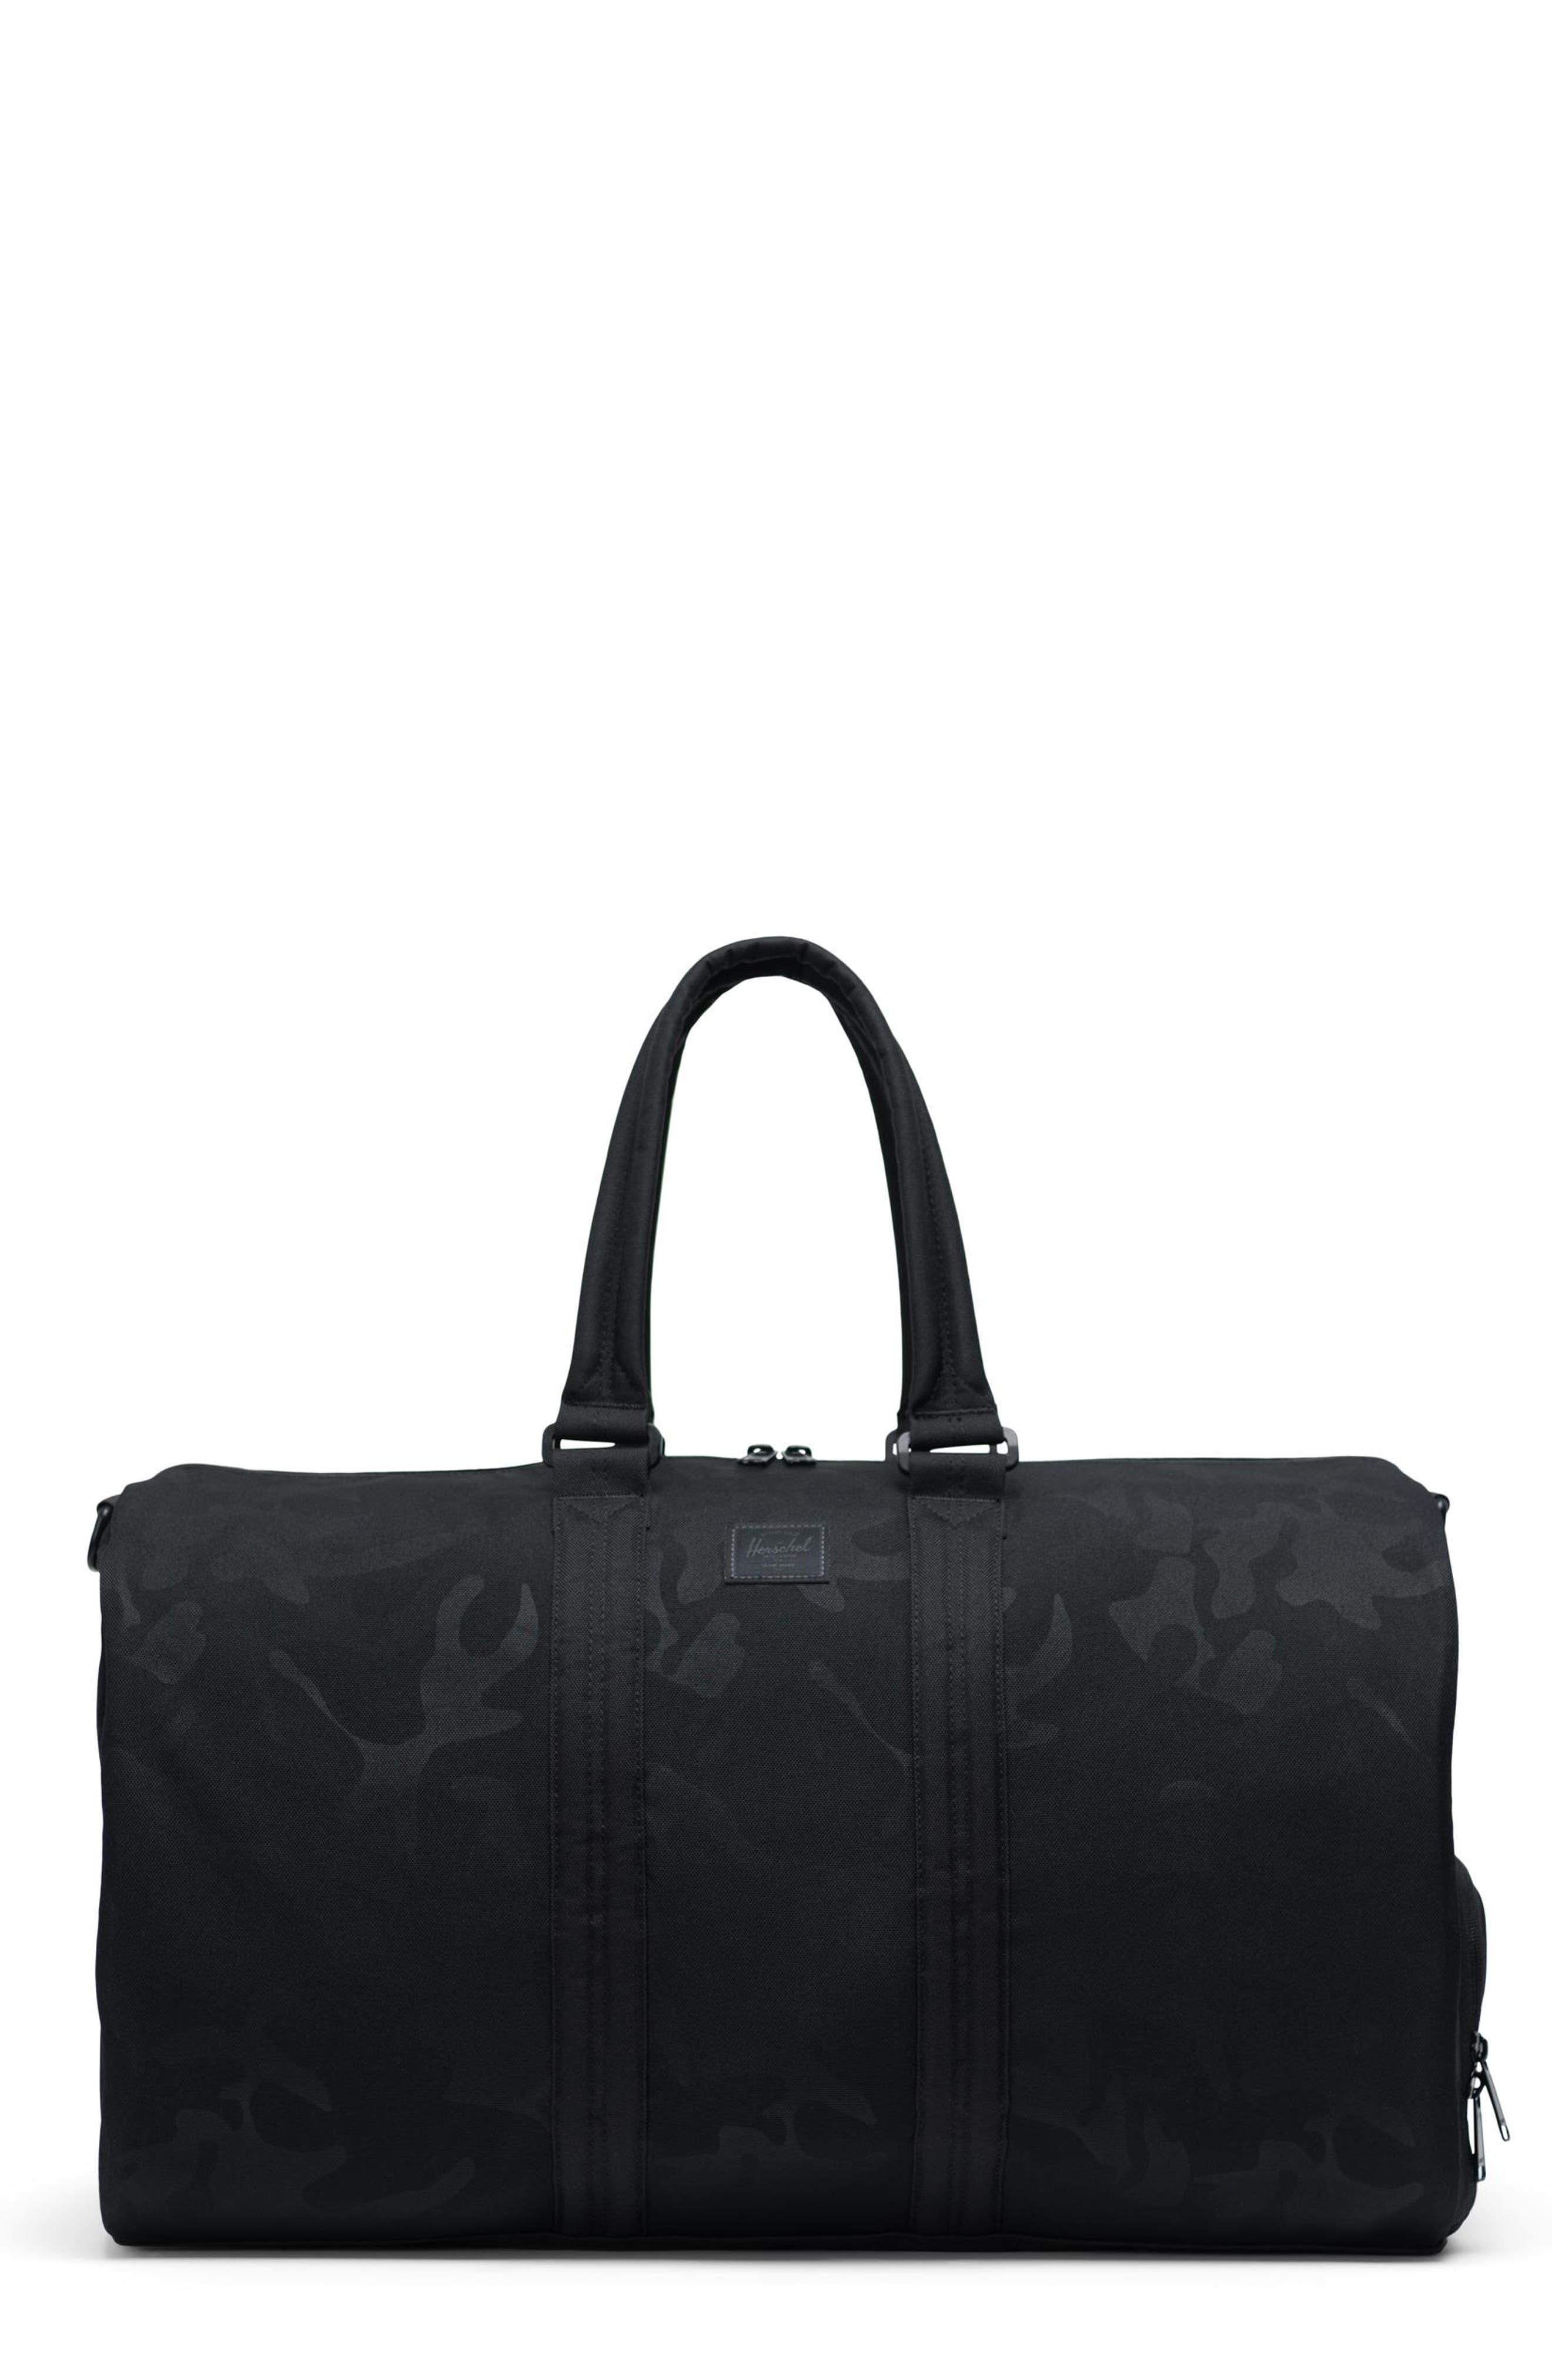 HERSCHEL SUPPLY CO. Duffle Bag, Main, color, BLACK/ TONAL CAMO